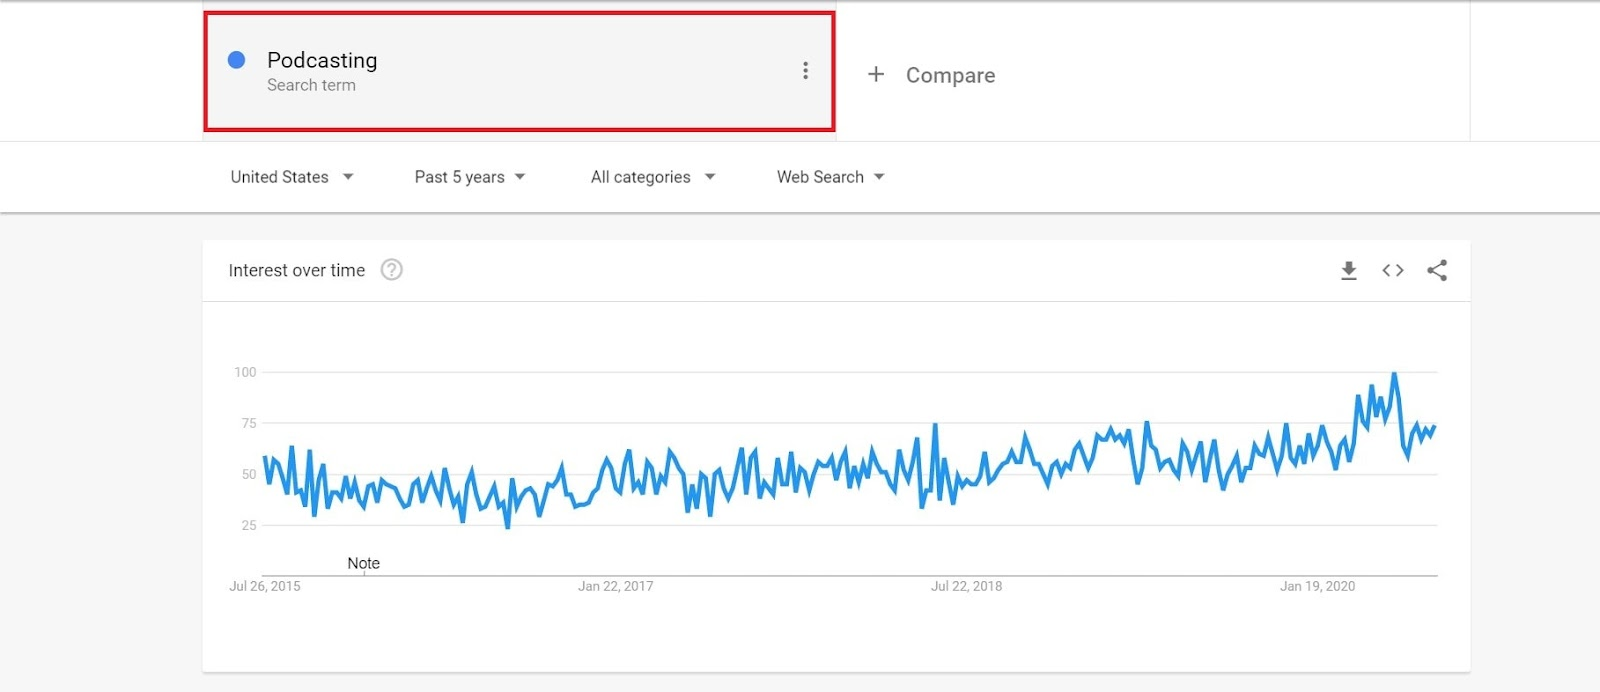 Keyword trends